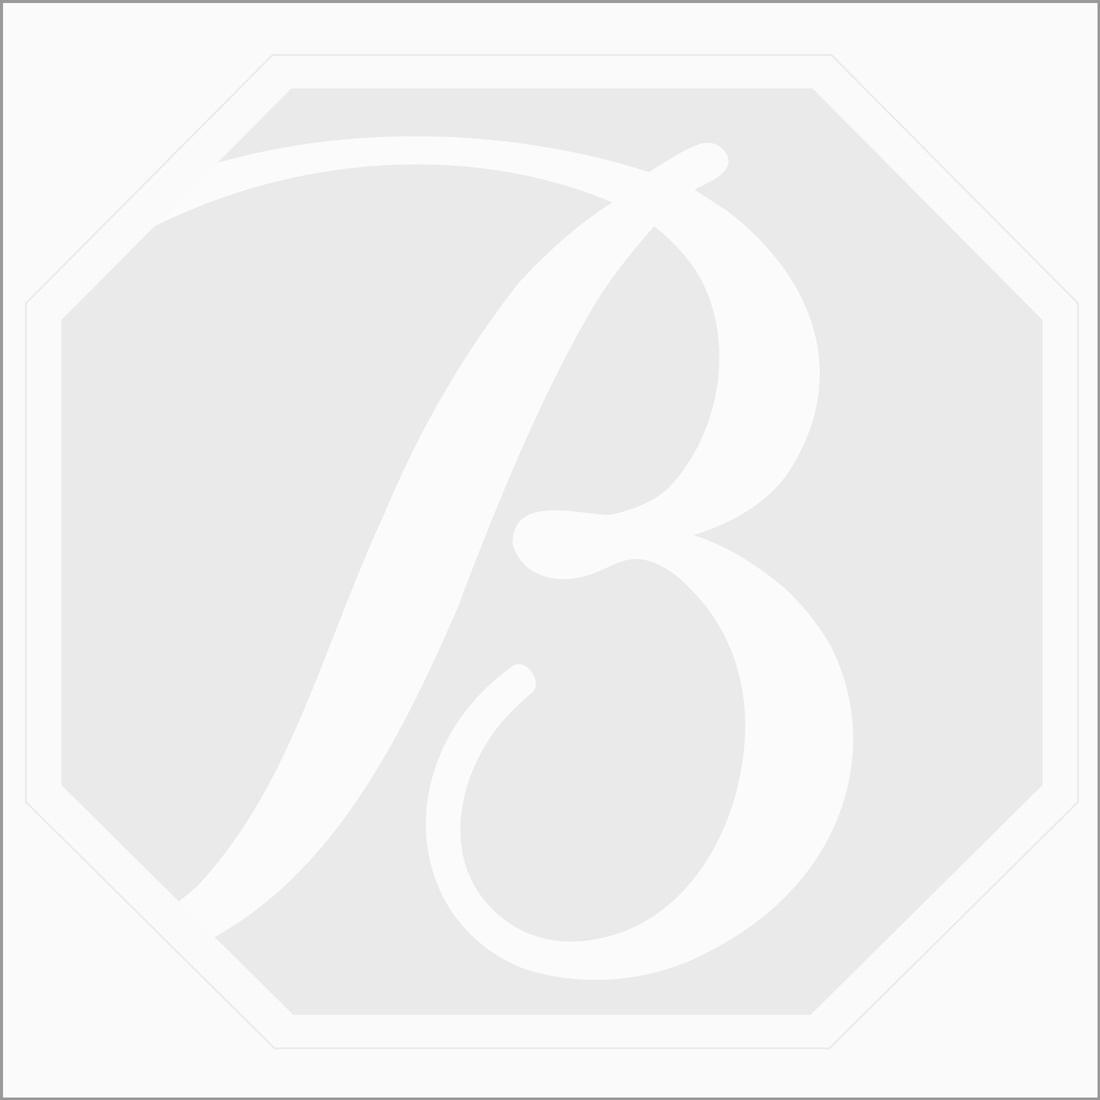 Black Diamond Cubes - 1 Line - 43.20 carats (BDiaCu1006)